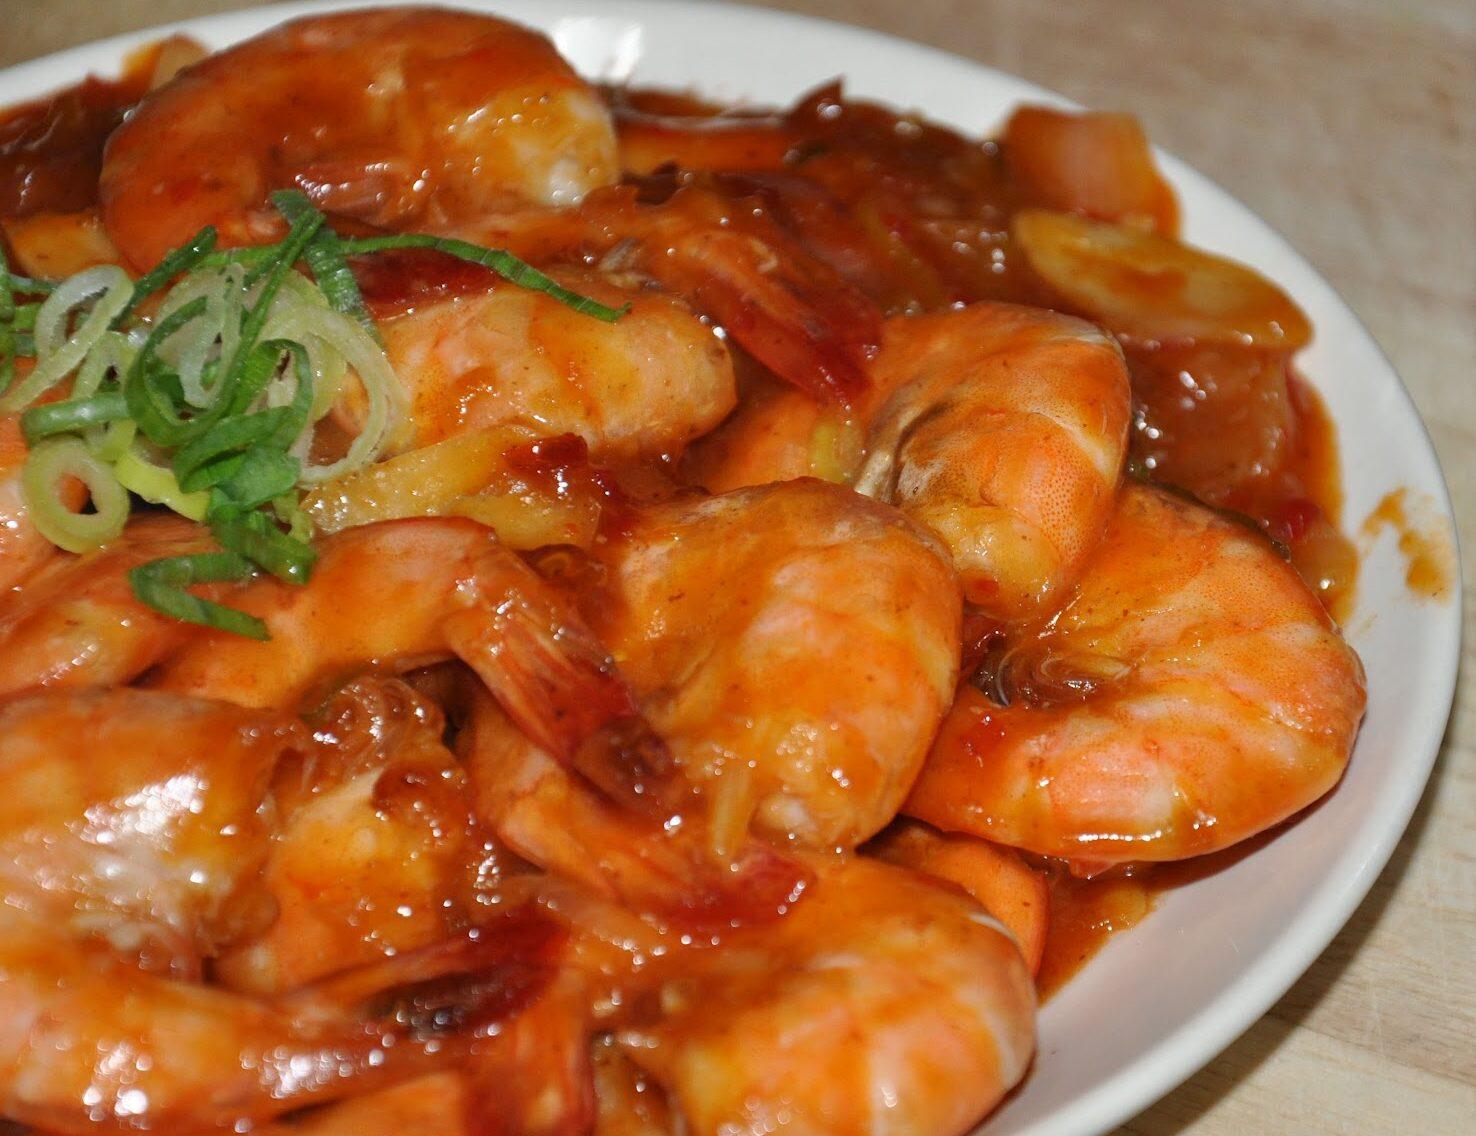 resep udang asam manis pedas